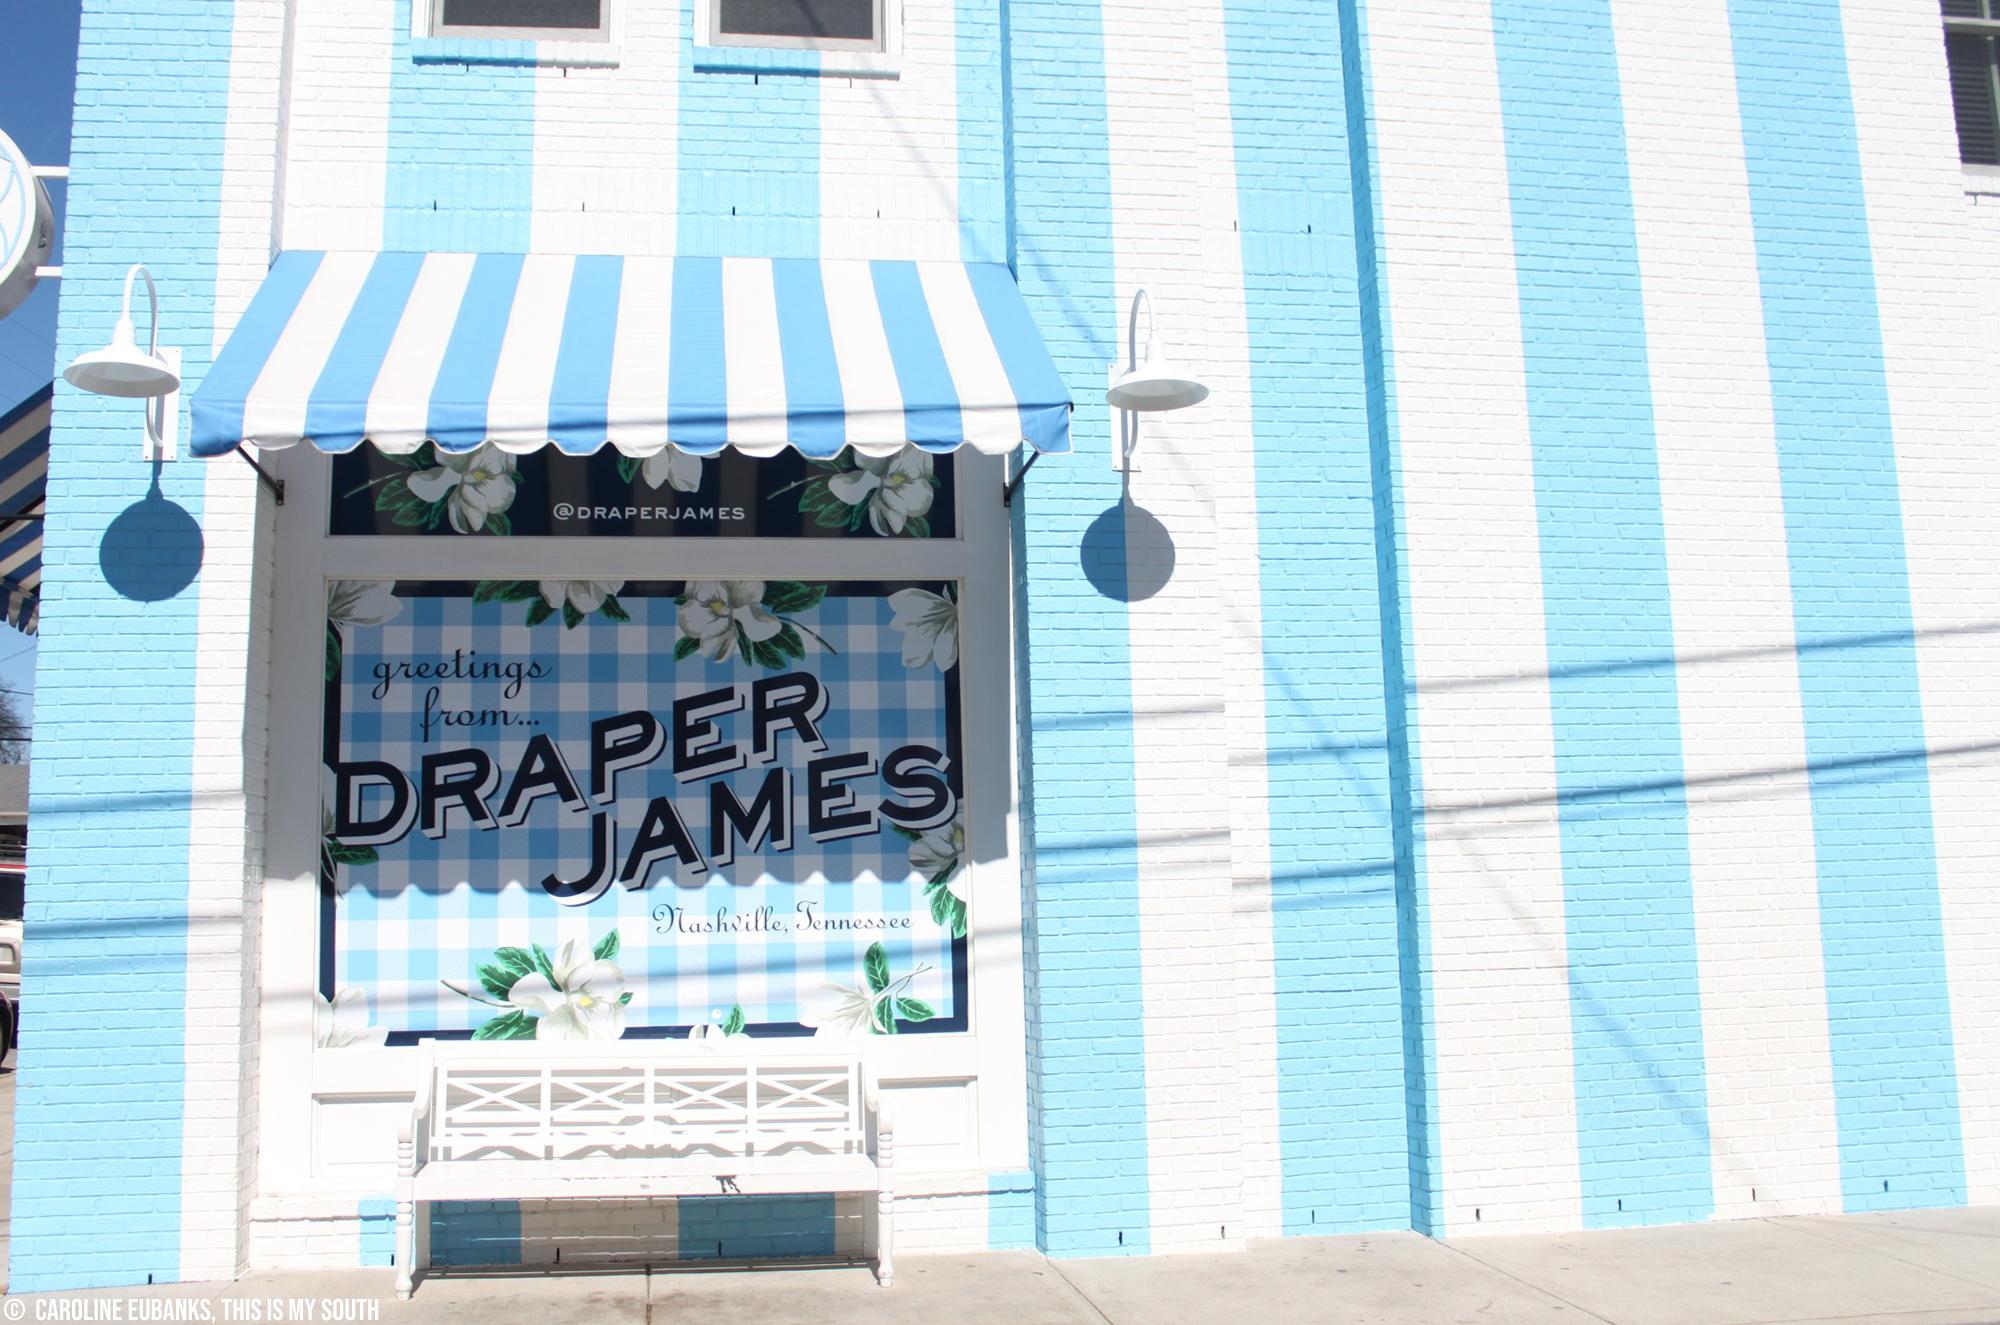 Draper James.jpg